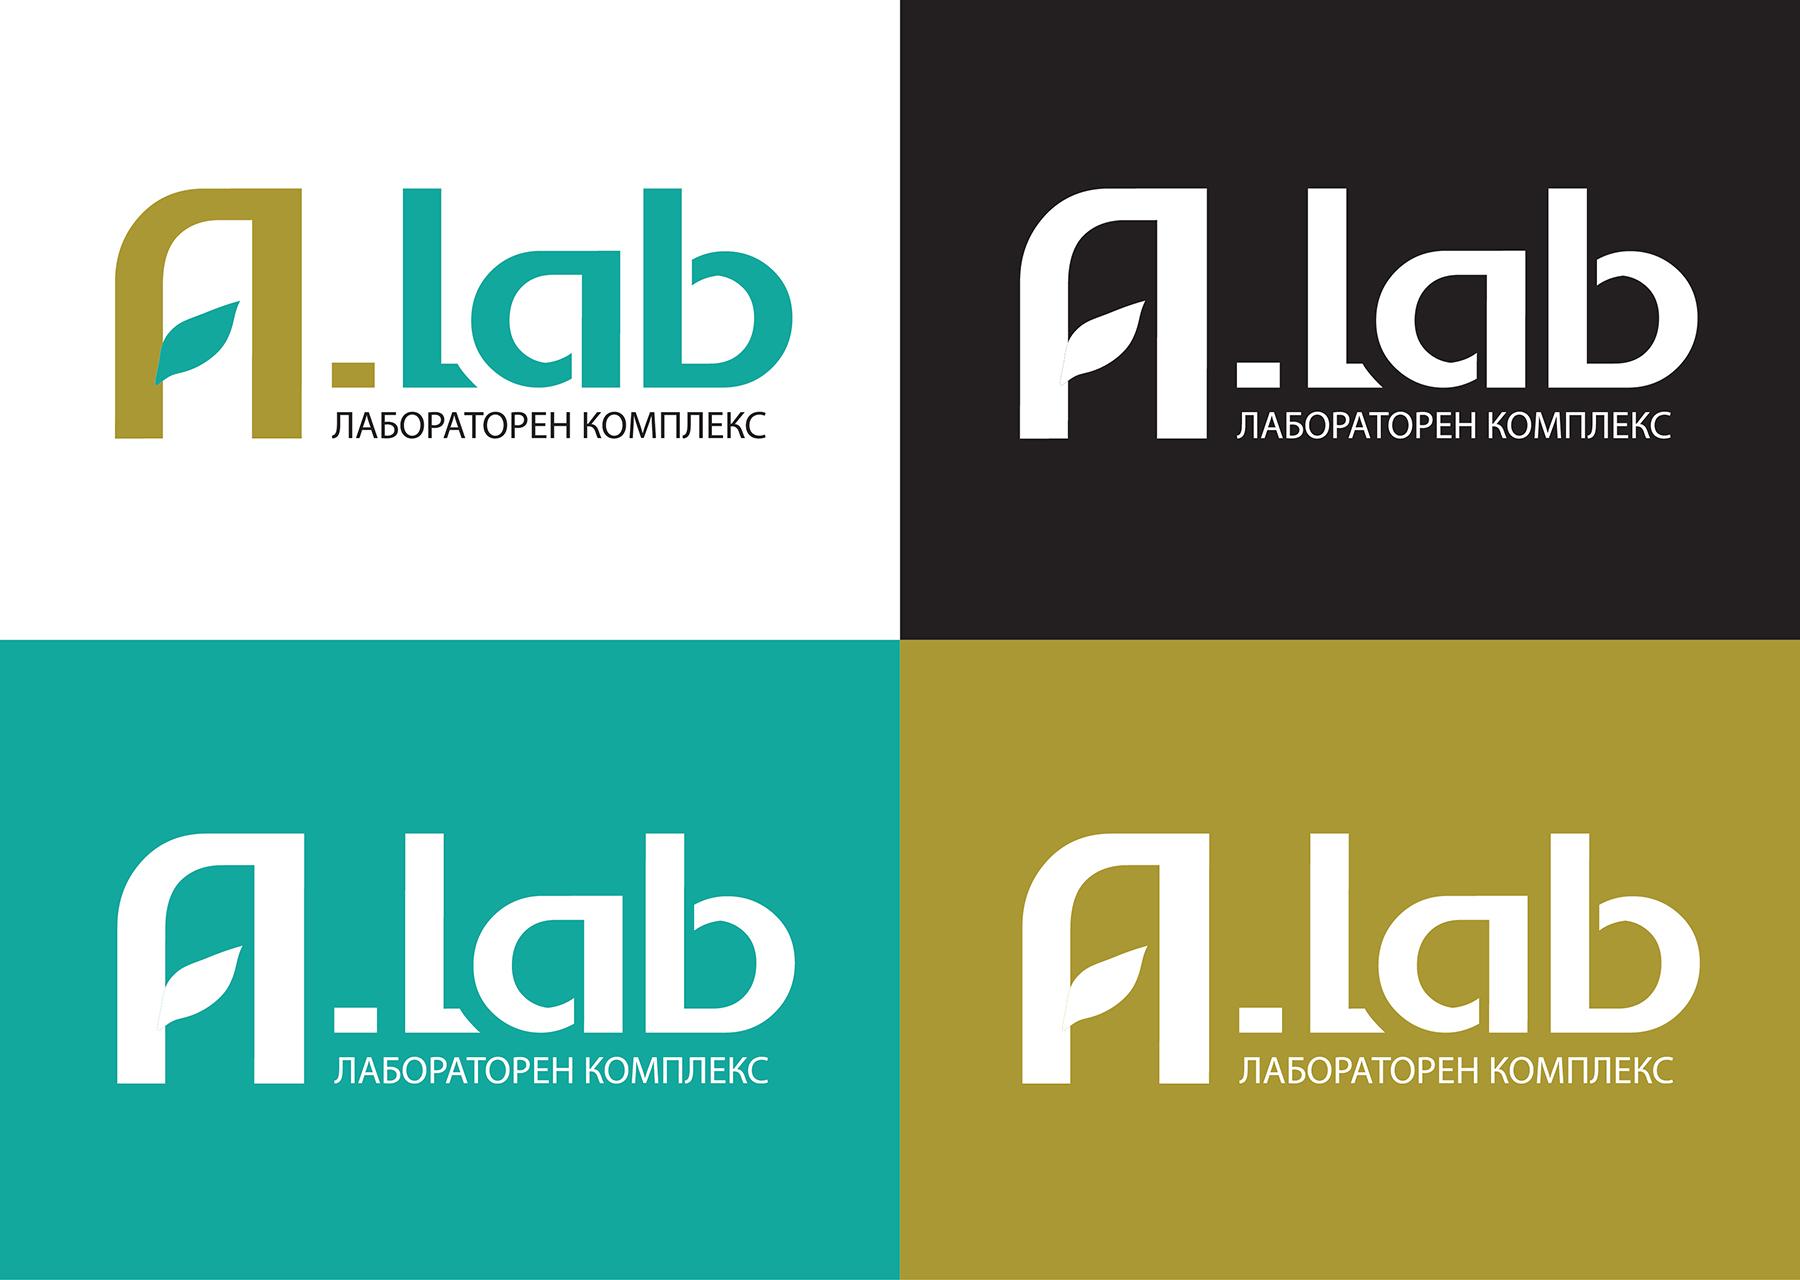 Dizajn Redizajn I Vektorizirane Na Logo Dzhej Aj Dzhej Dizajn